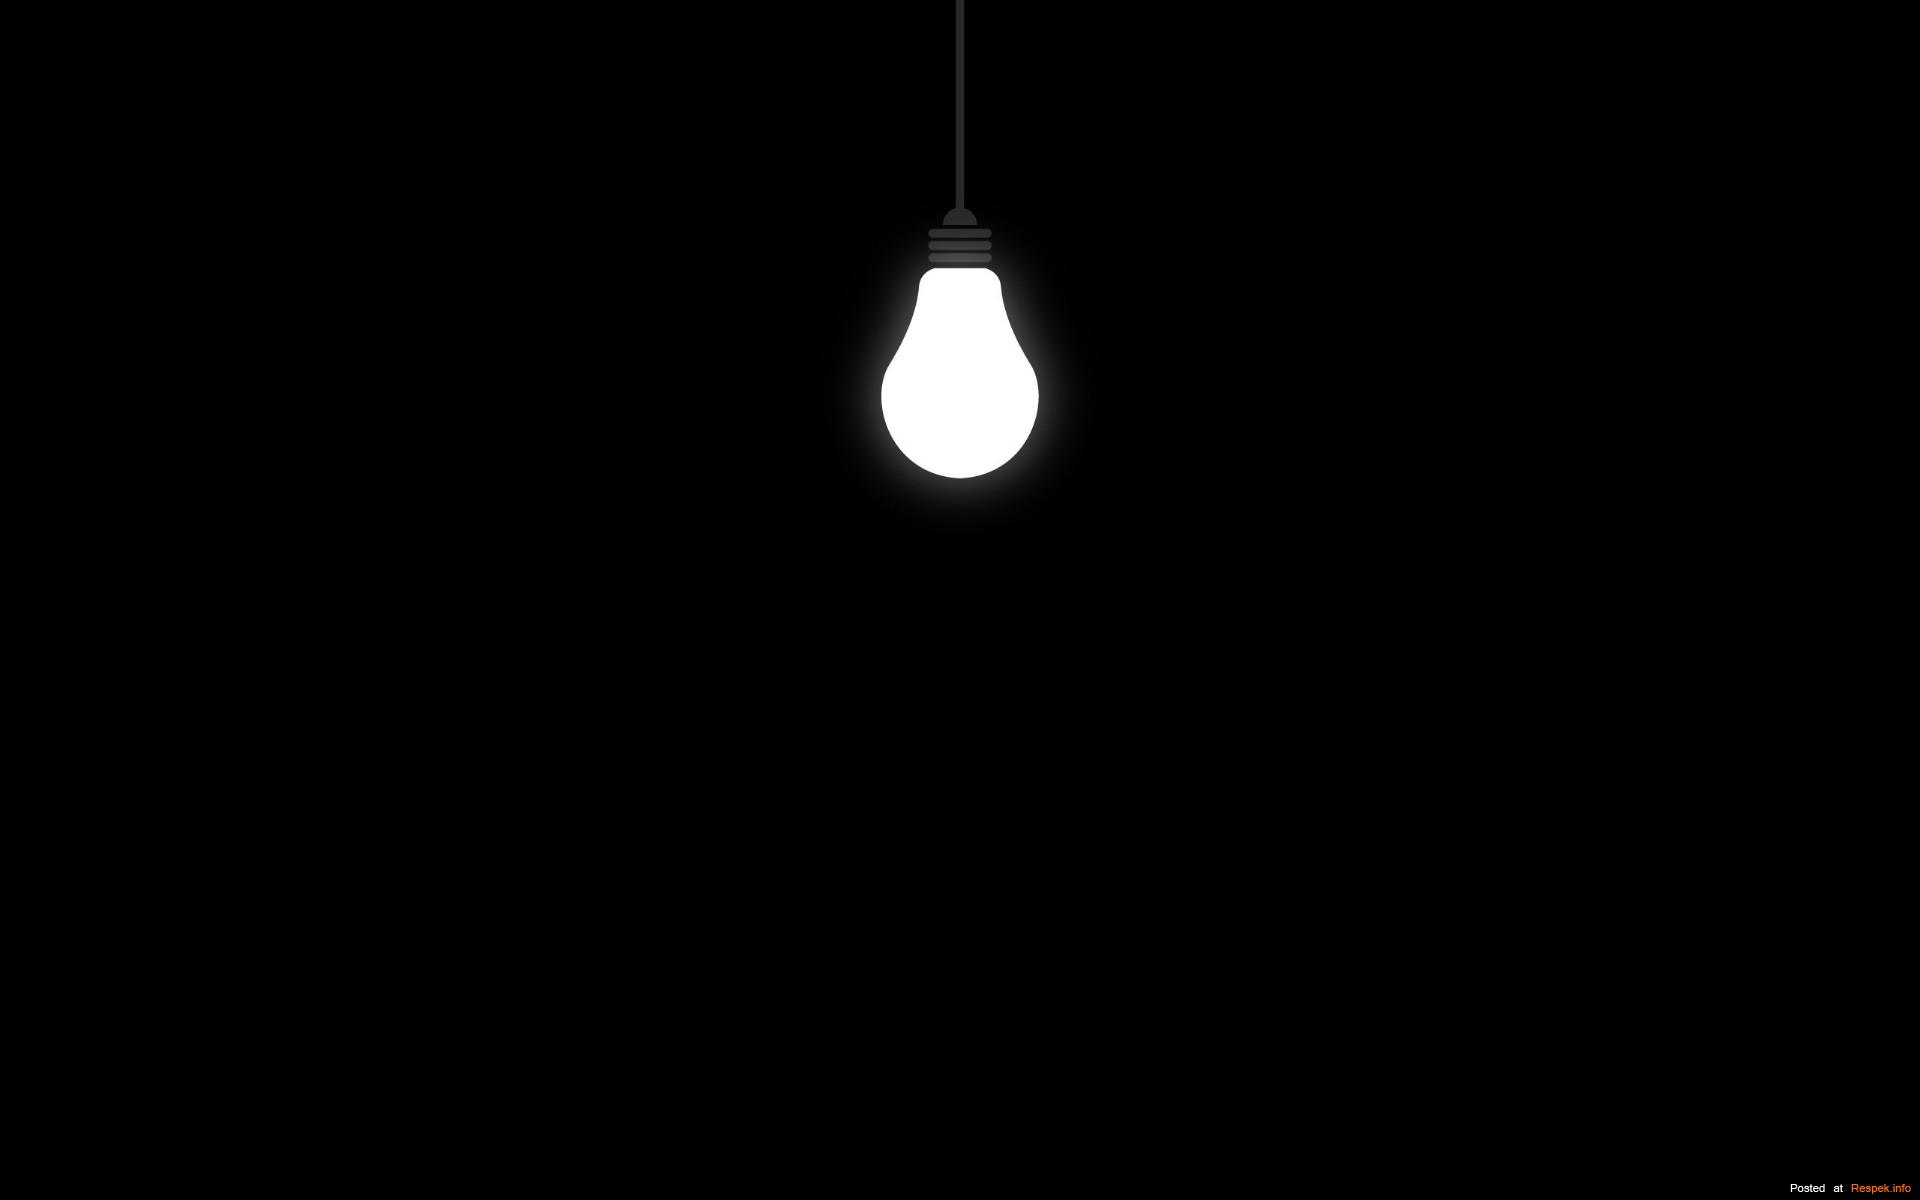 картинка черная на аву